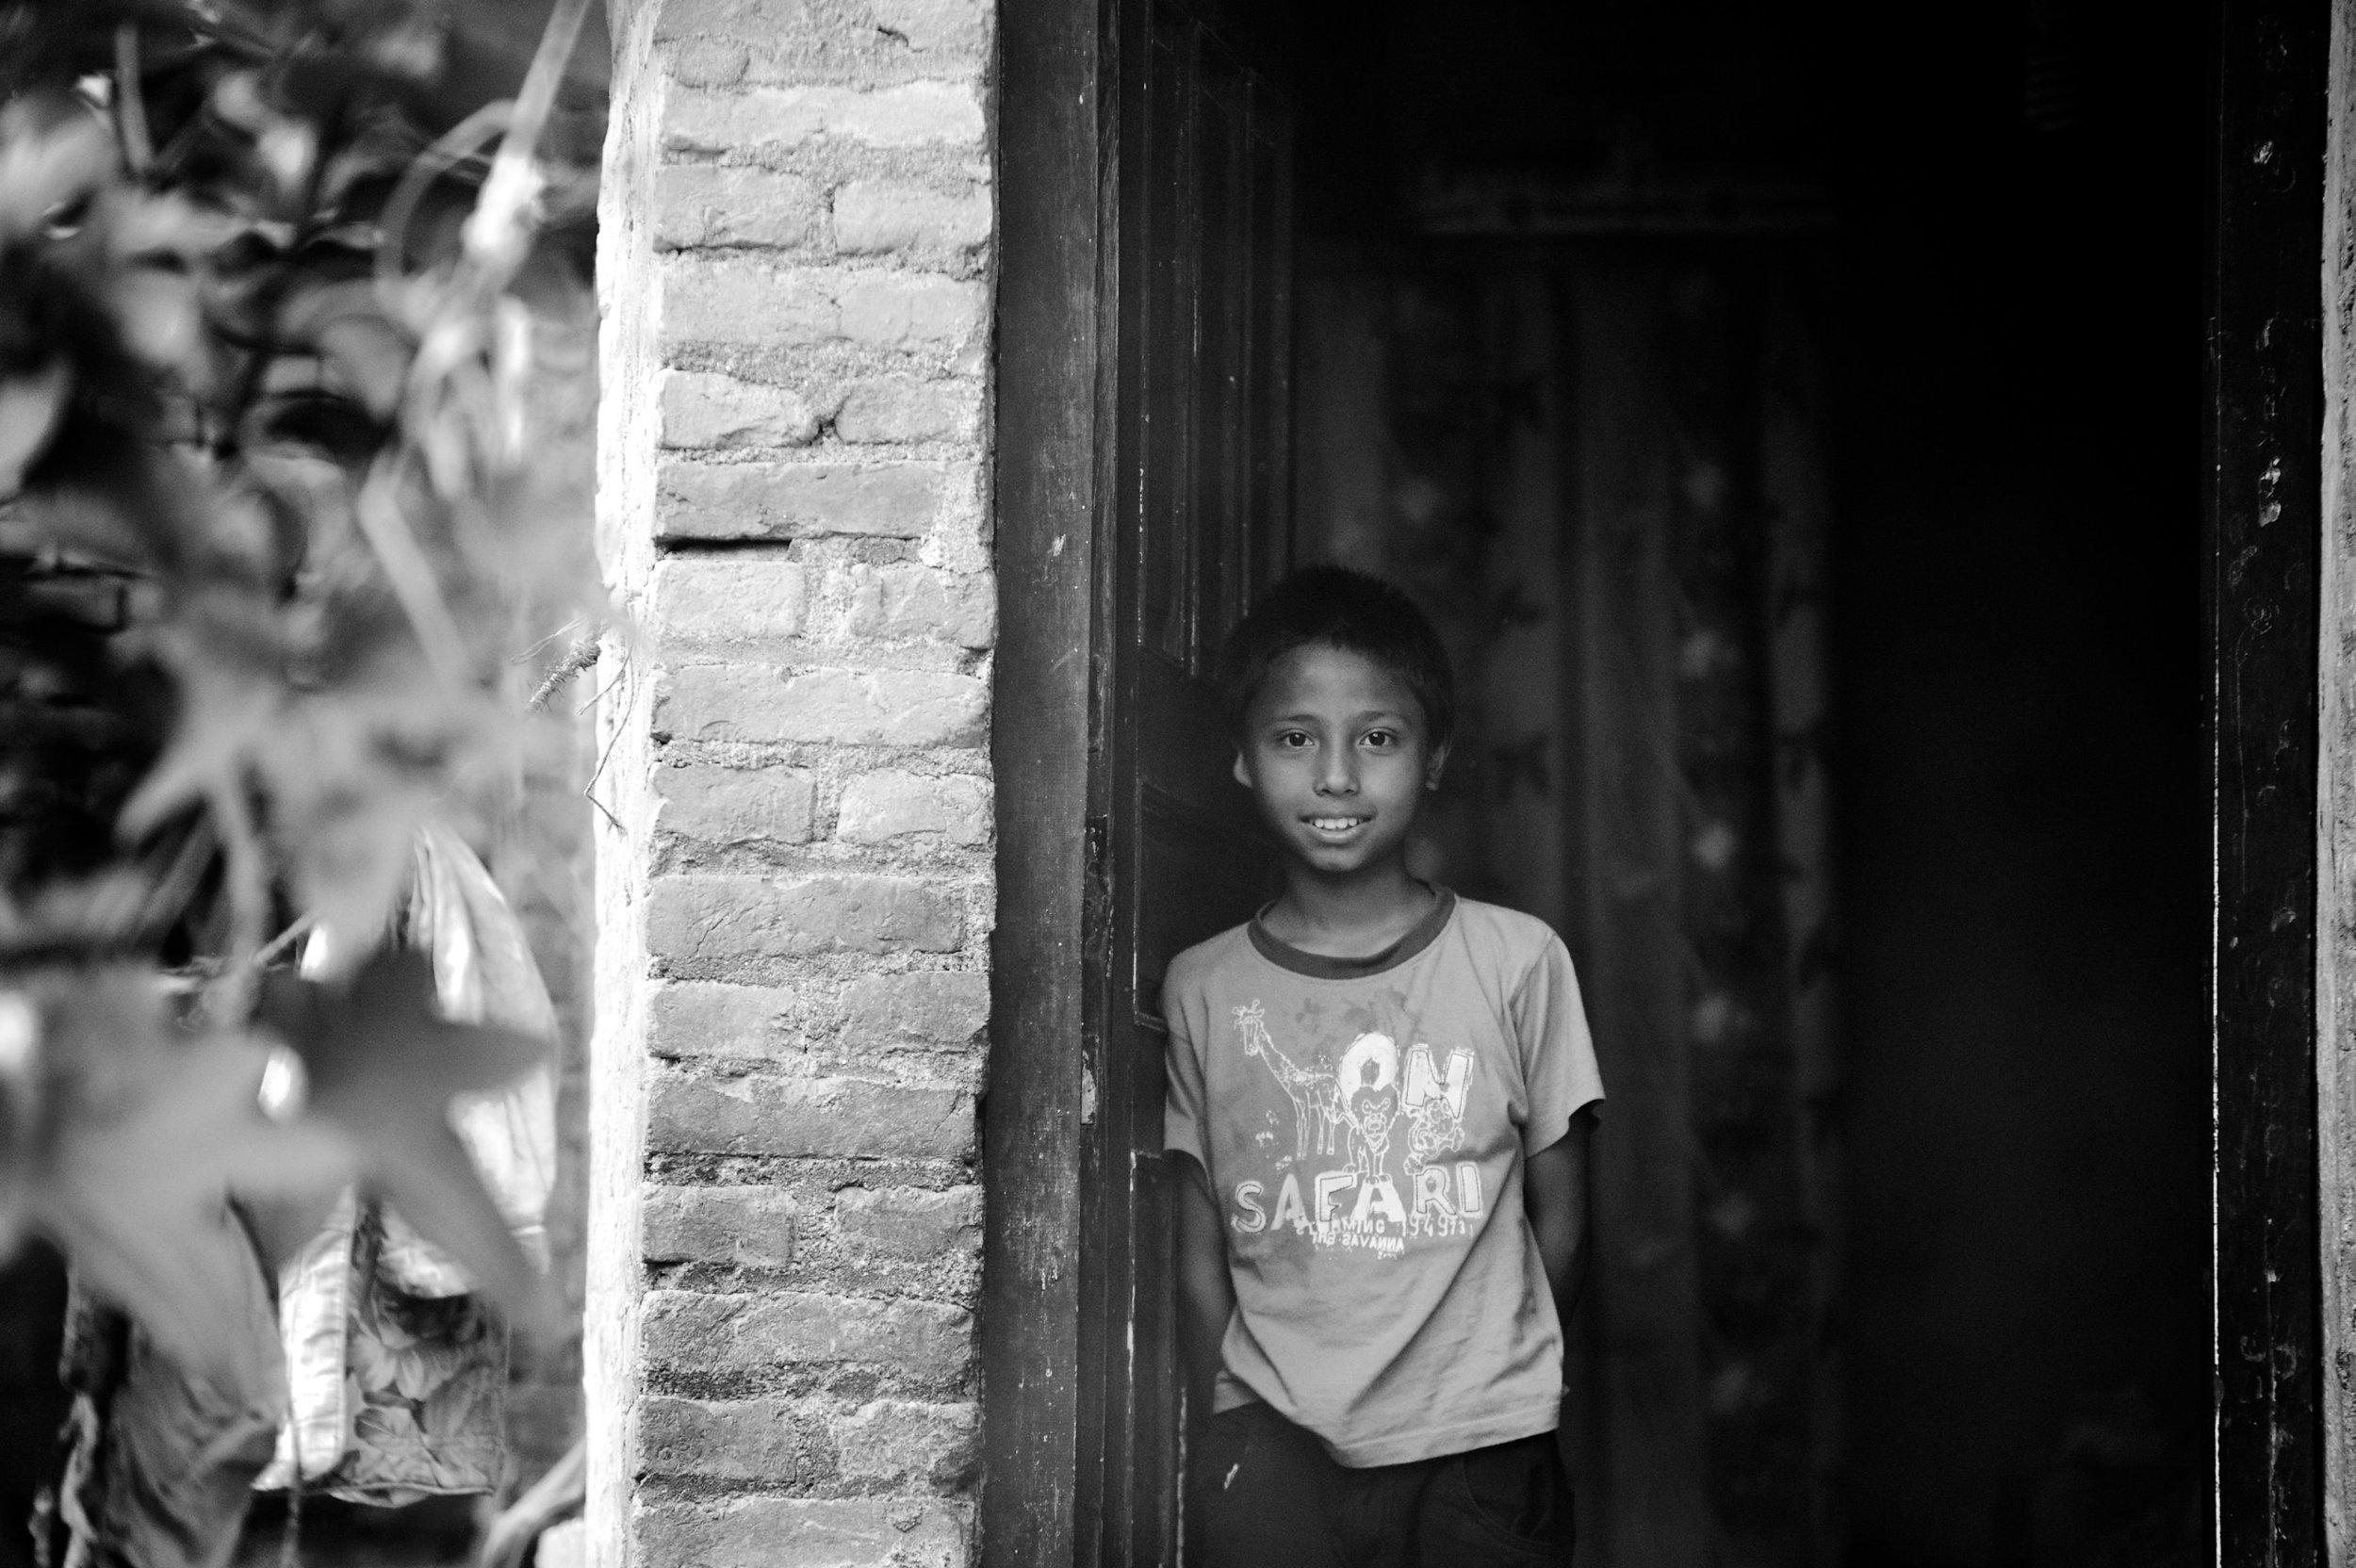 boy in doorway baw.jpg